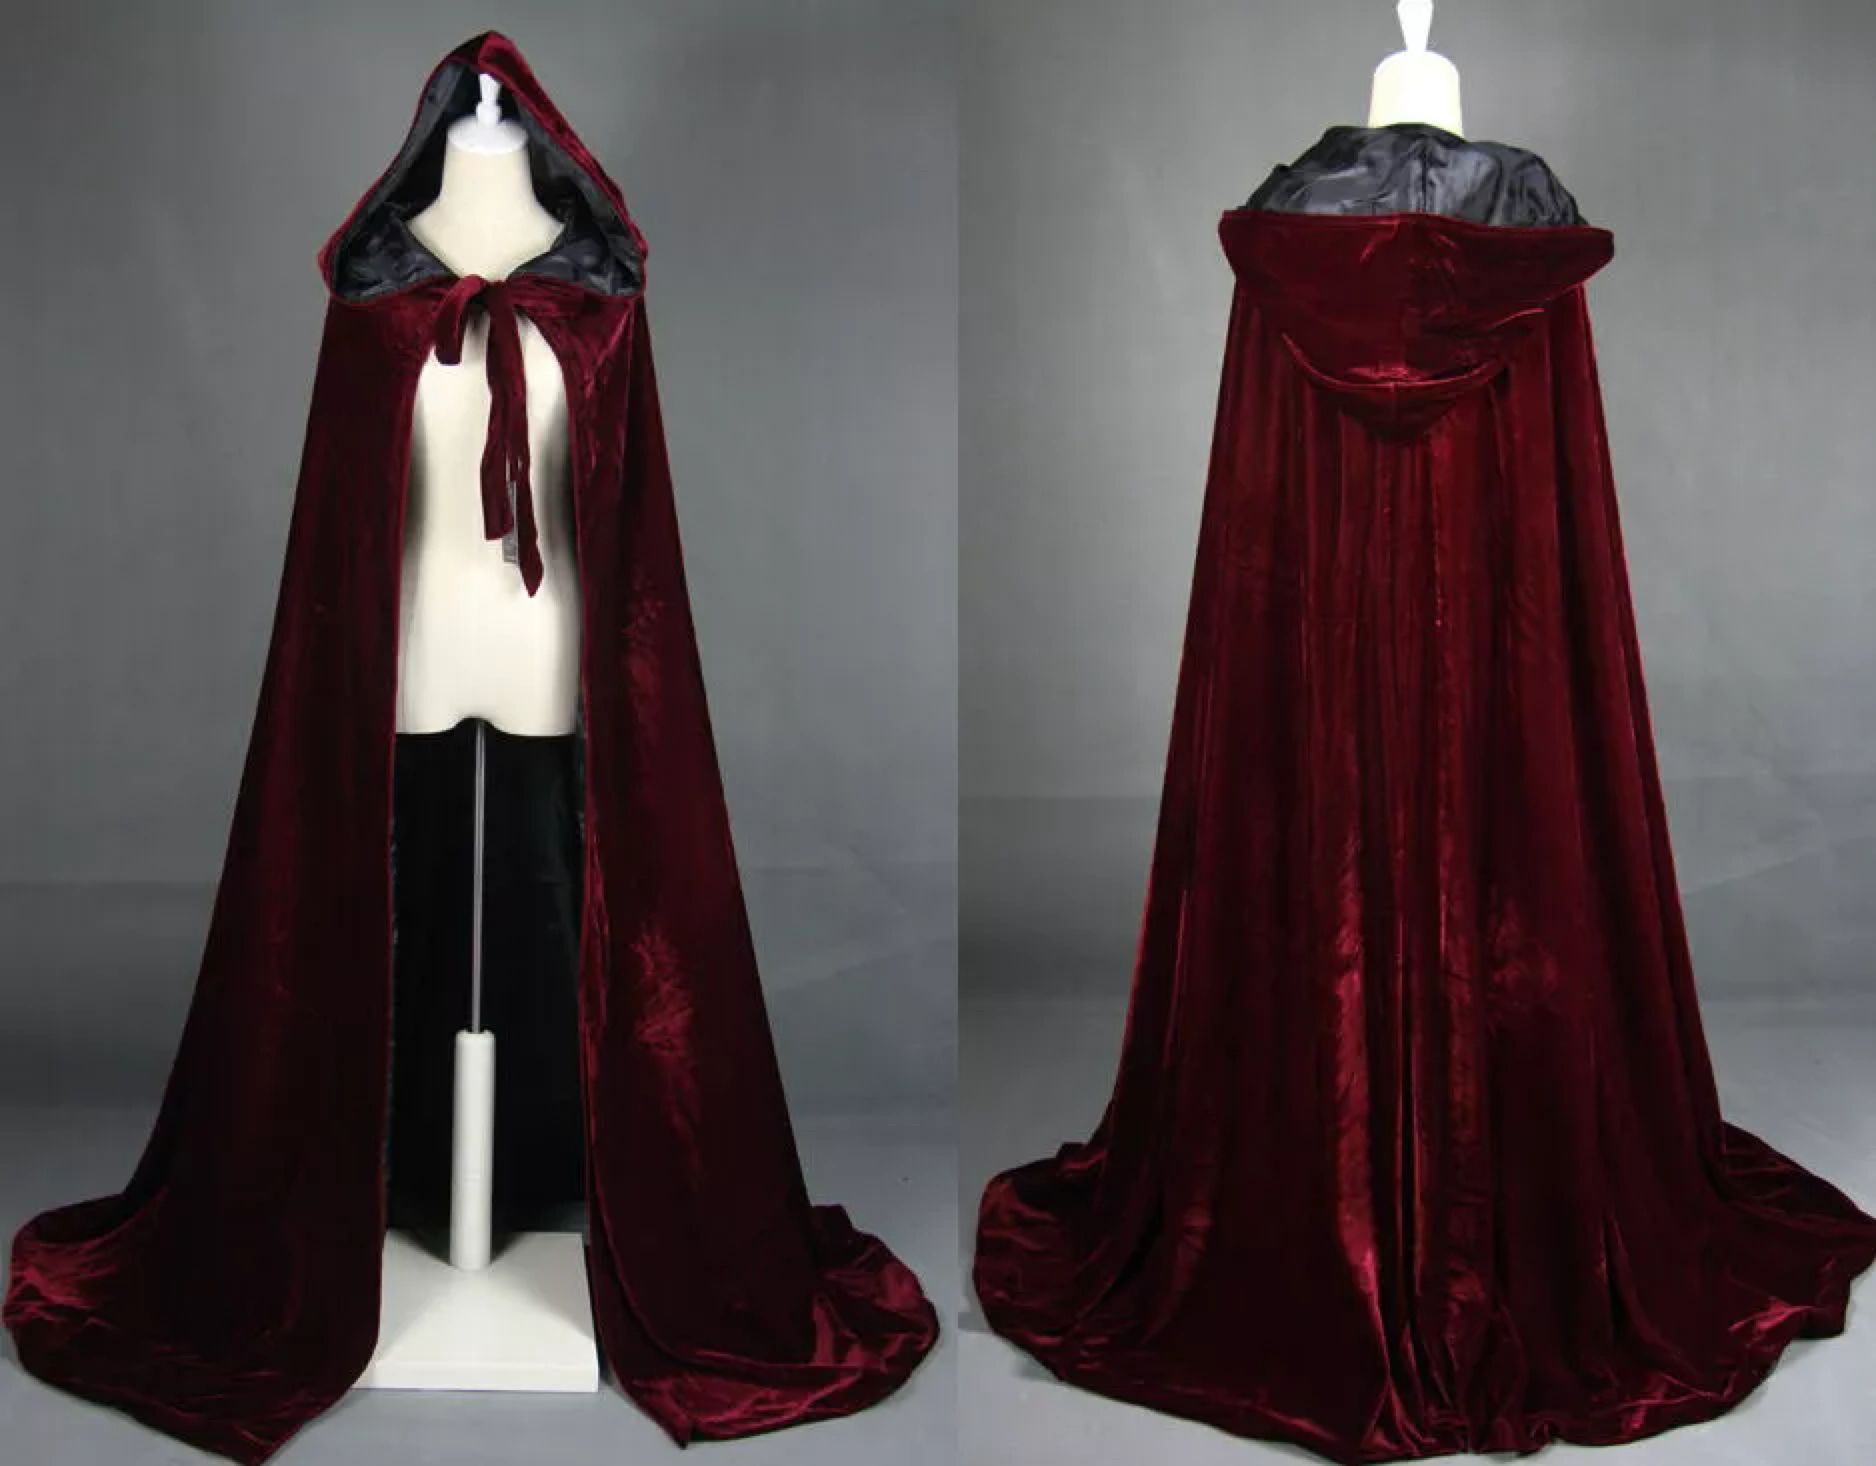 Halloween Unisex Hooded Velvet Cloak Robe Medieval Witchcraft Cape Robe Costume